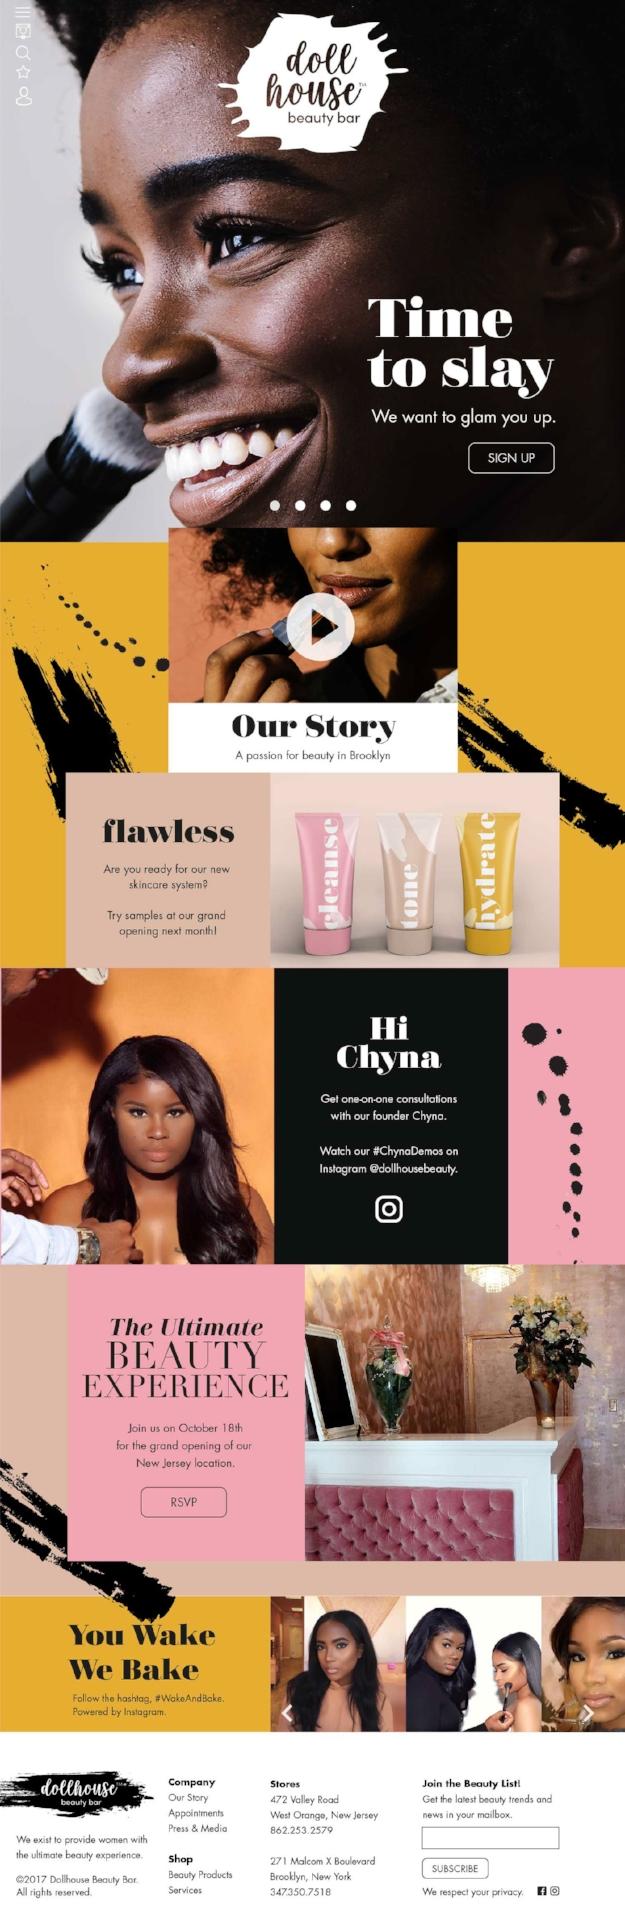 toya-design-co-dollhouse-cosmetics.jpg